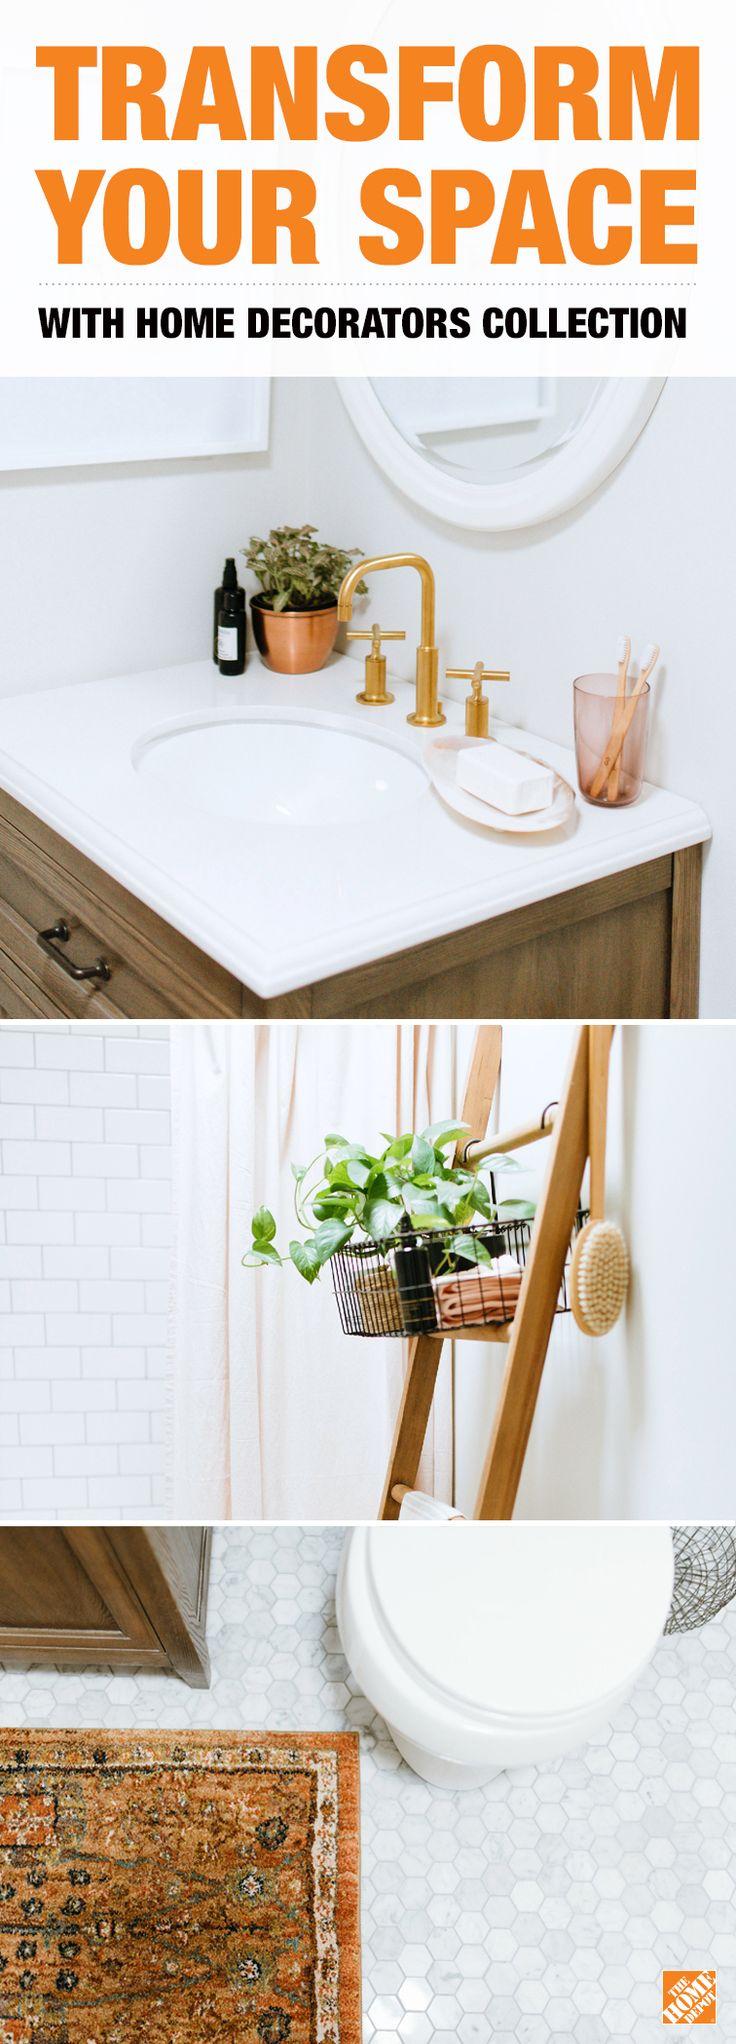 images about Bathroom Design Ideas on Pinterest